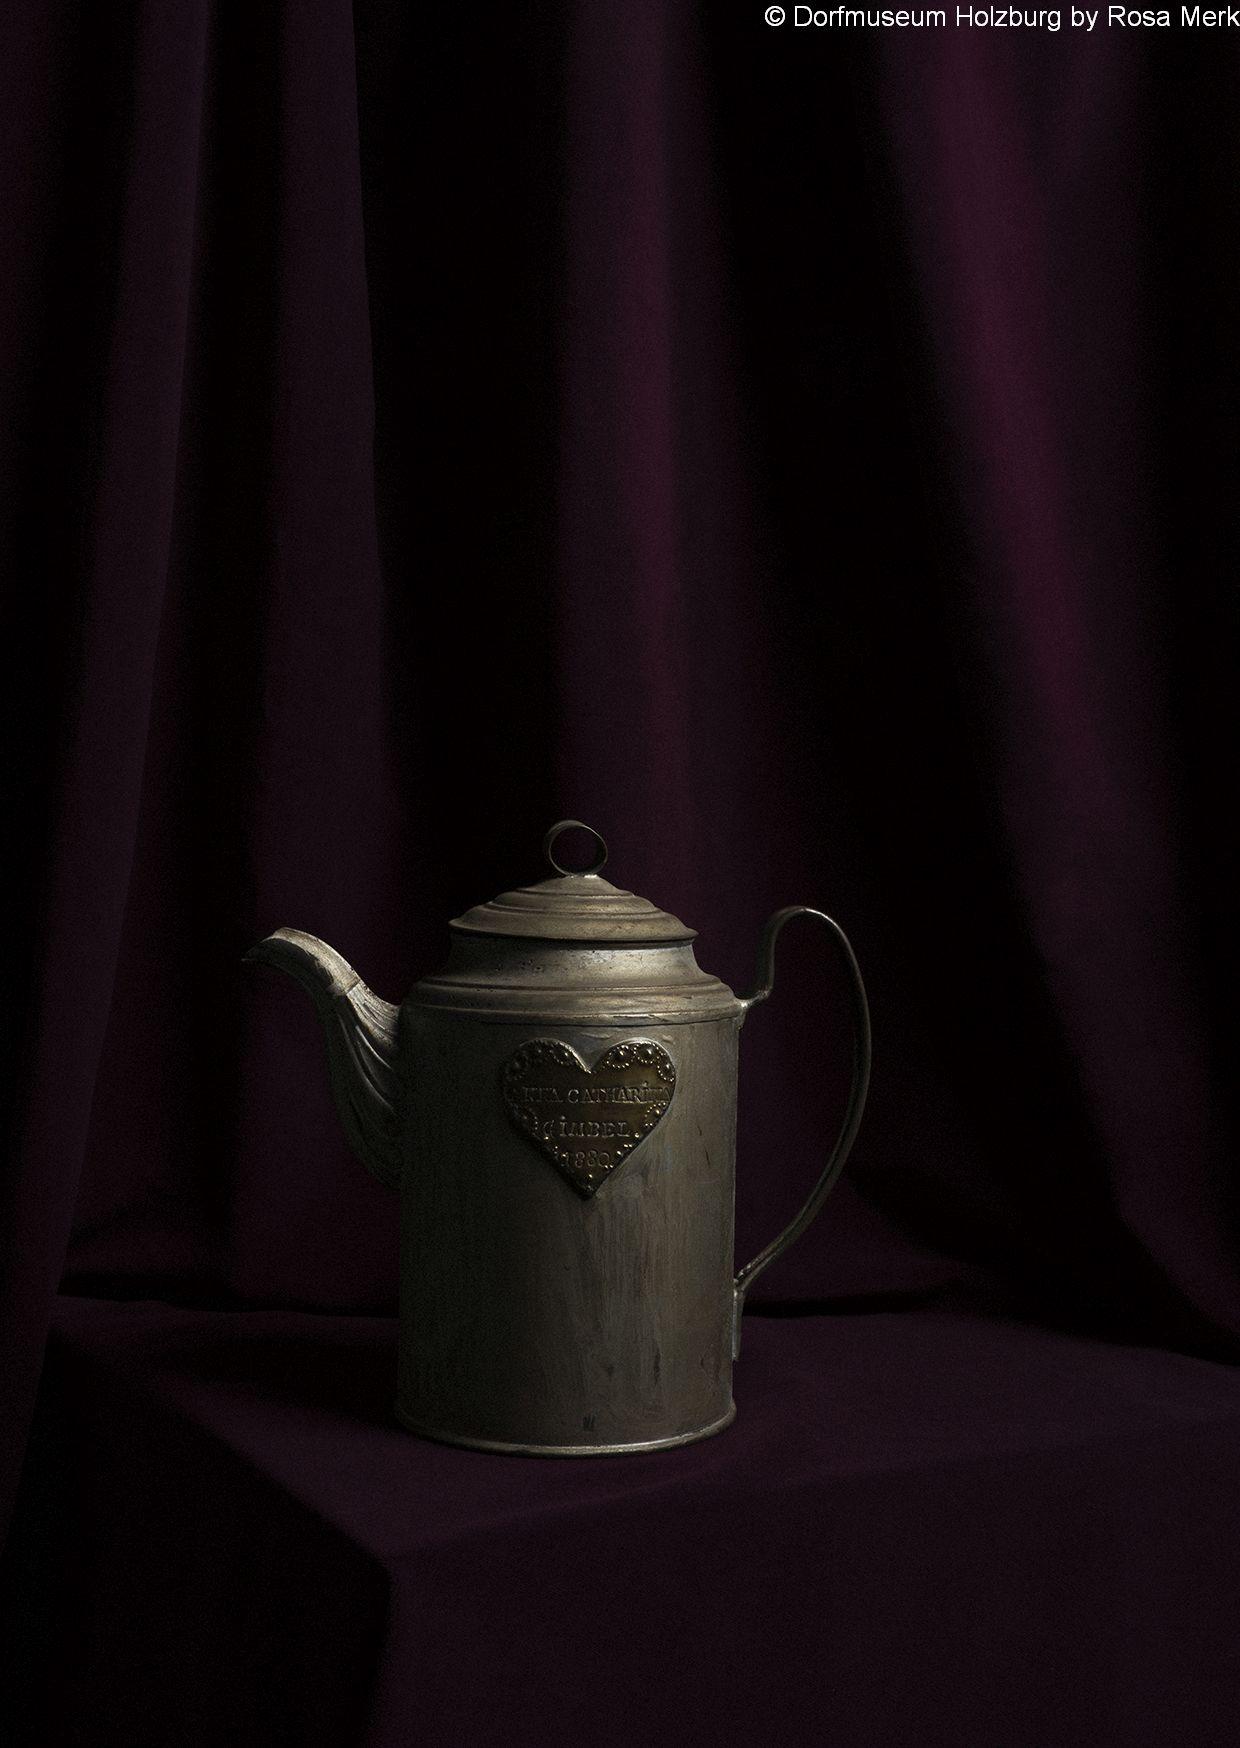 "Kaffeekanne aus Weißblech, 1880, punziertes Messingherz mit Initialen der Besitzerin ""Anna Caterina Gimpel 1880"""